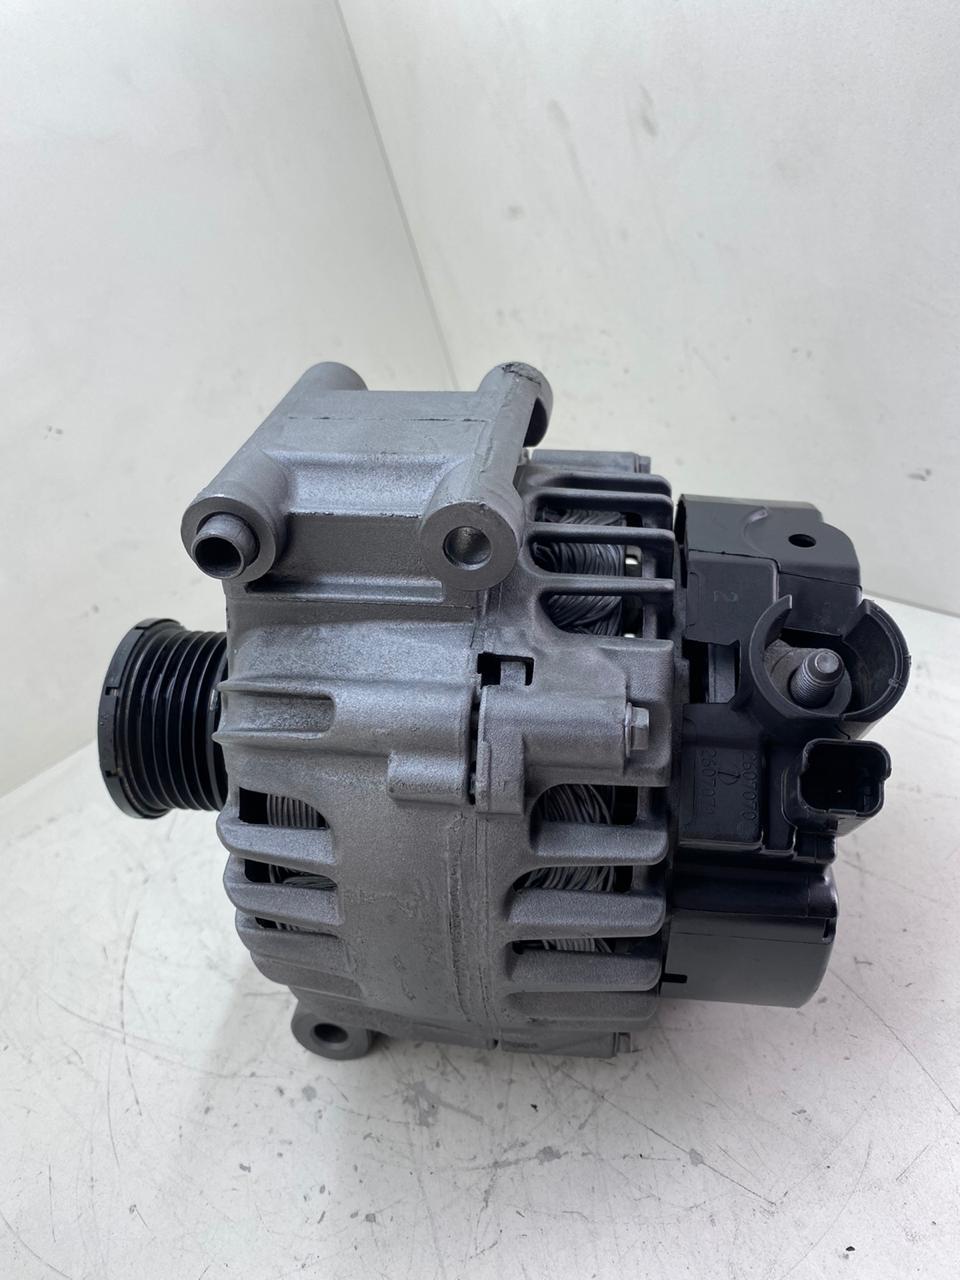 Alternador VALEO Citroen DS3 Mini Cooper 12V 120A V761548480 01 76154848001 09779